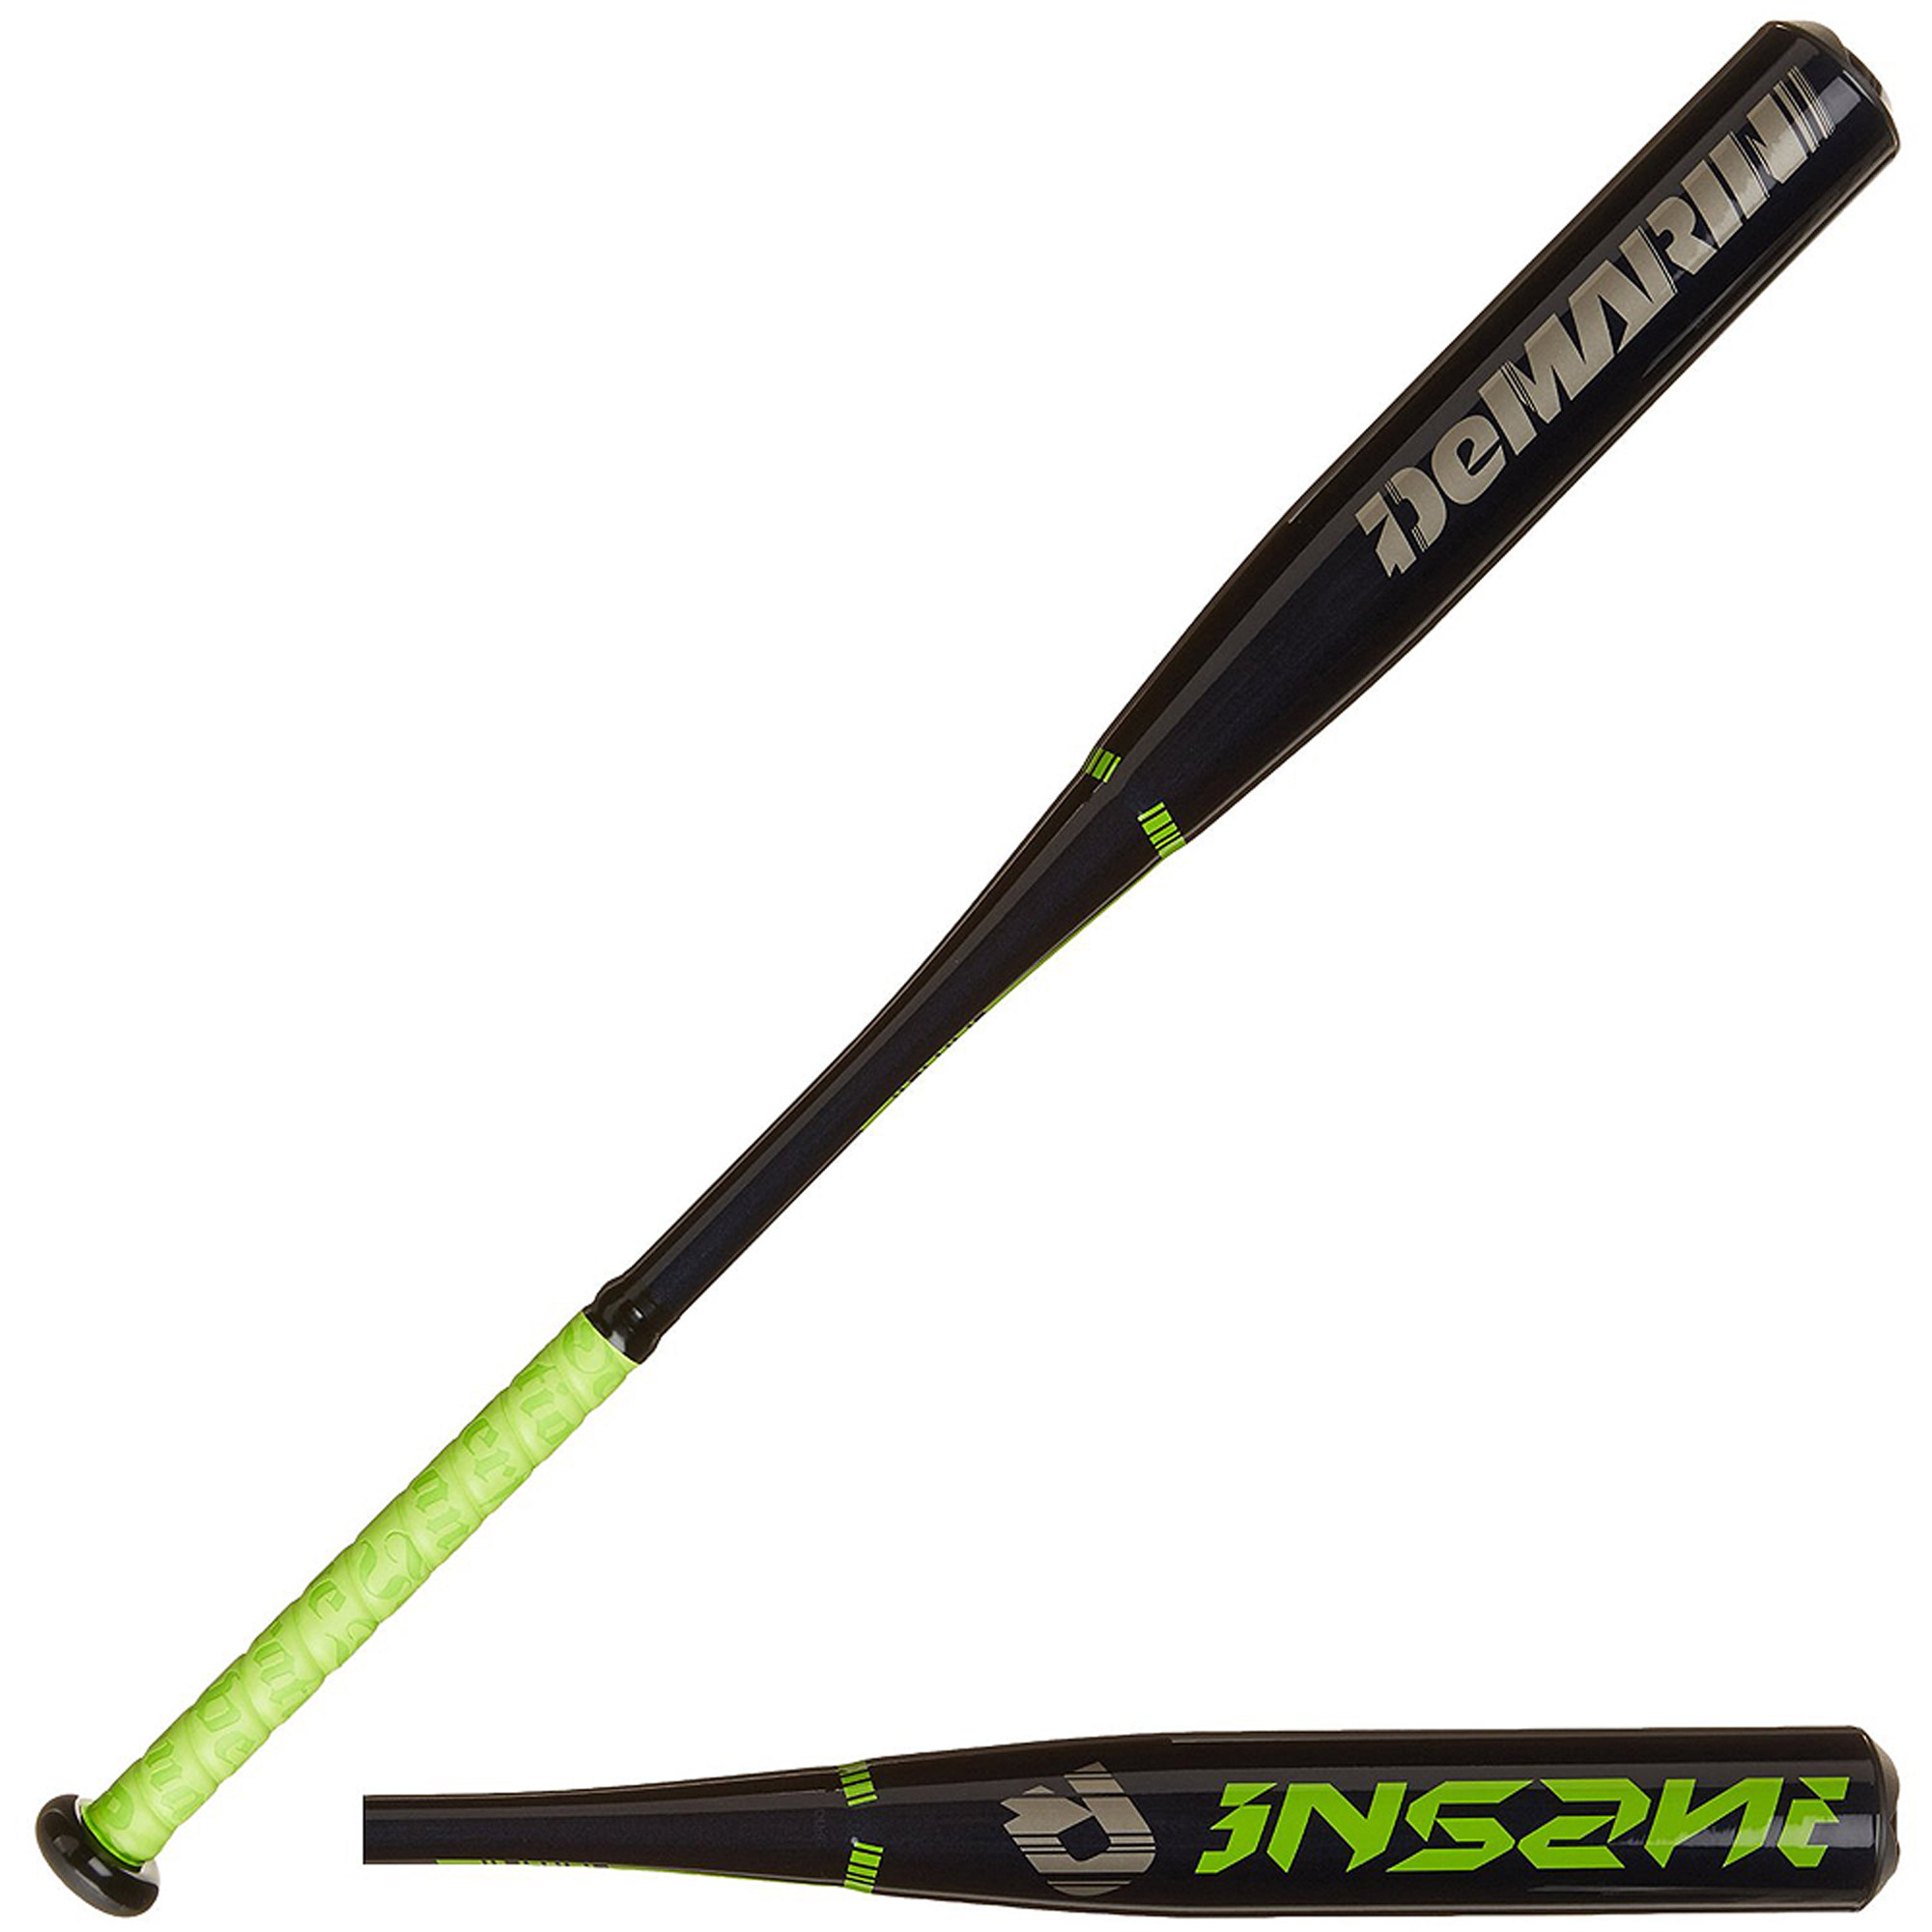 DeMarini Insane Youth Big Barrel -12 Baseball Bat by Wilson Sporting Goods